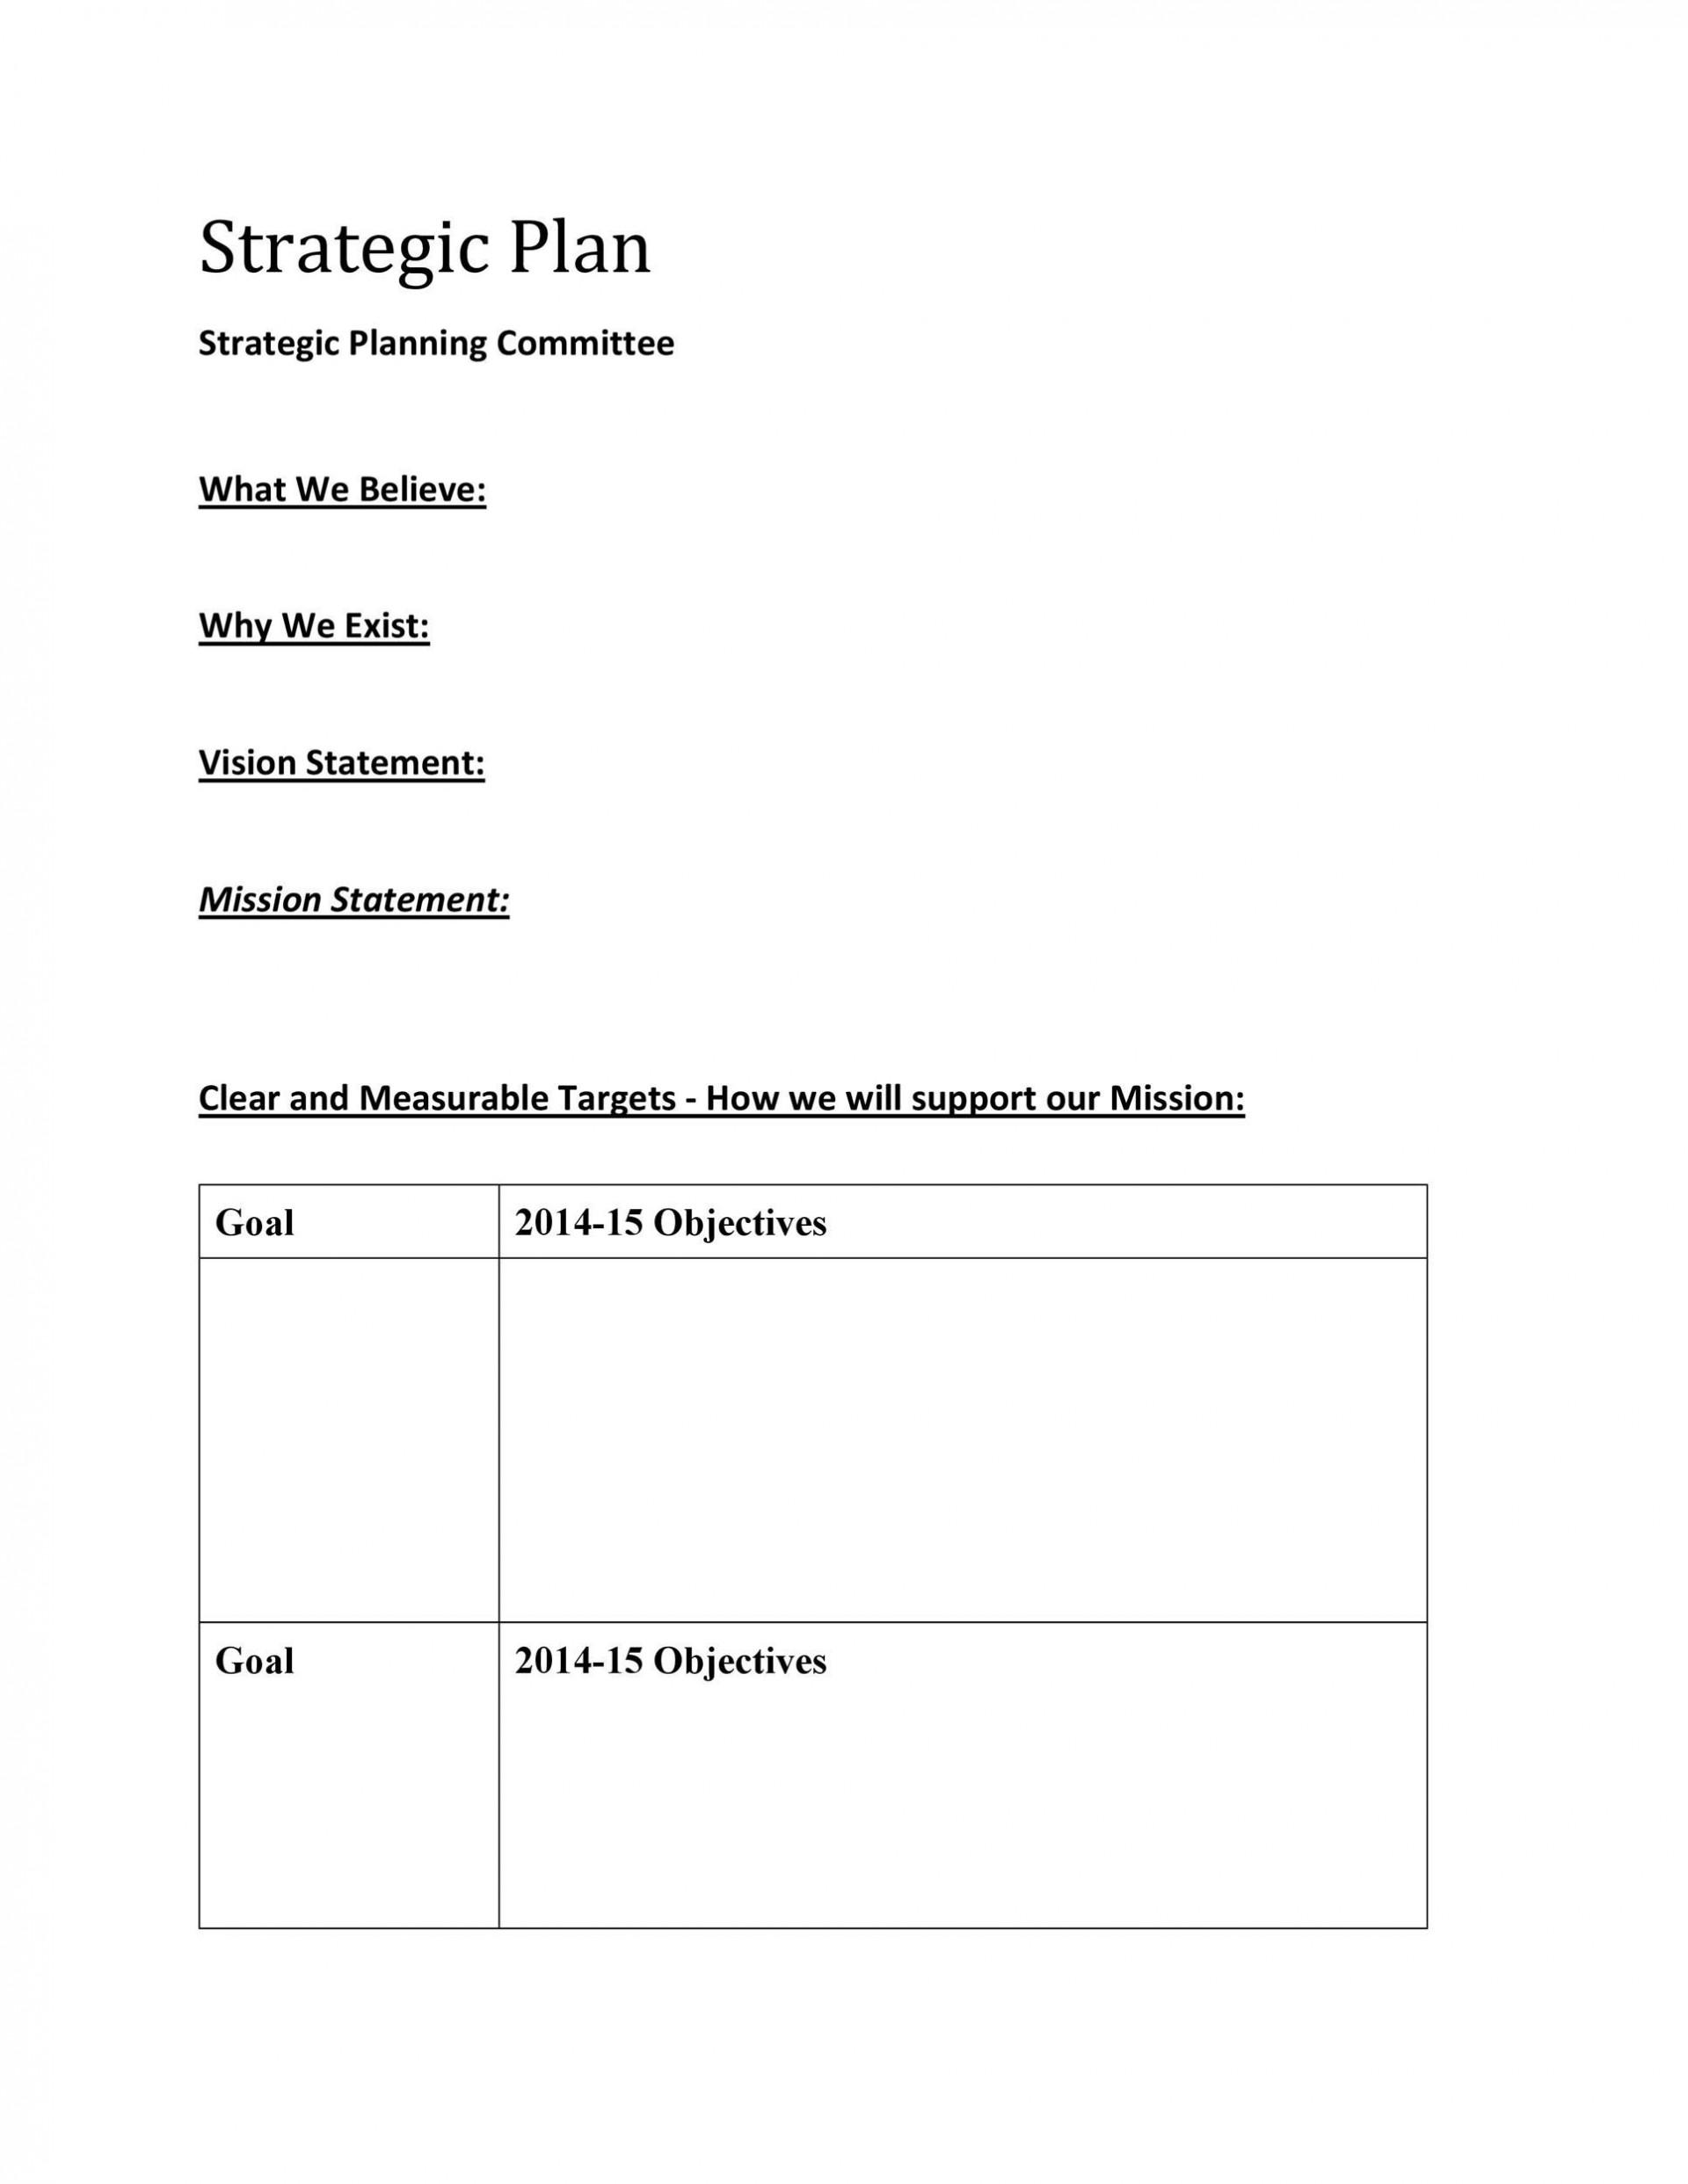 009 Breathtaking Strategic Plan Word Template High Resolution  Document Microsoft Marketing1920